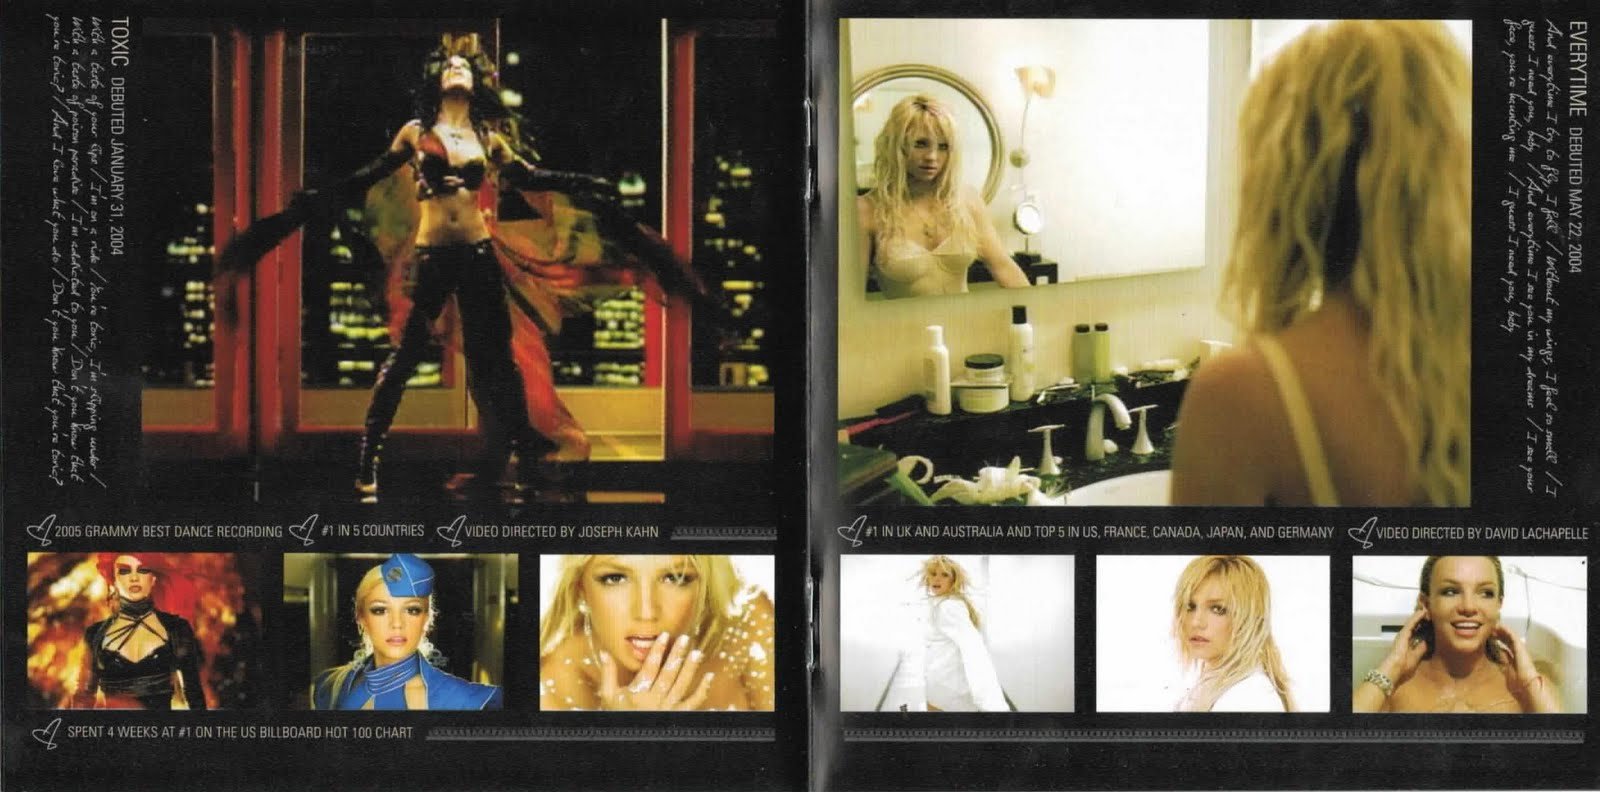 http://3.bp.blogspot.com/-G_7QwlMXqj0/T7e0gEkunuI/AAAAAAAAHmM/YCQMyyQZTyo/s1600/Britney-Spears-The-Singles-Collection+(6).JPG